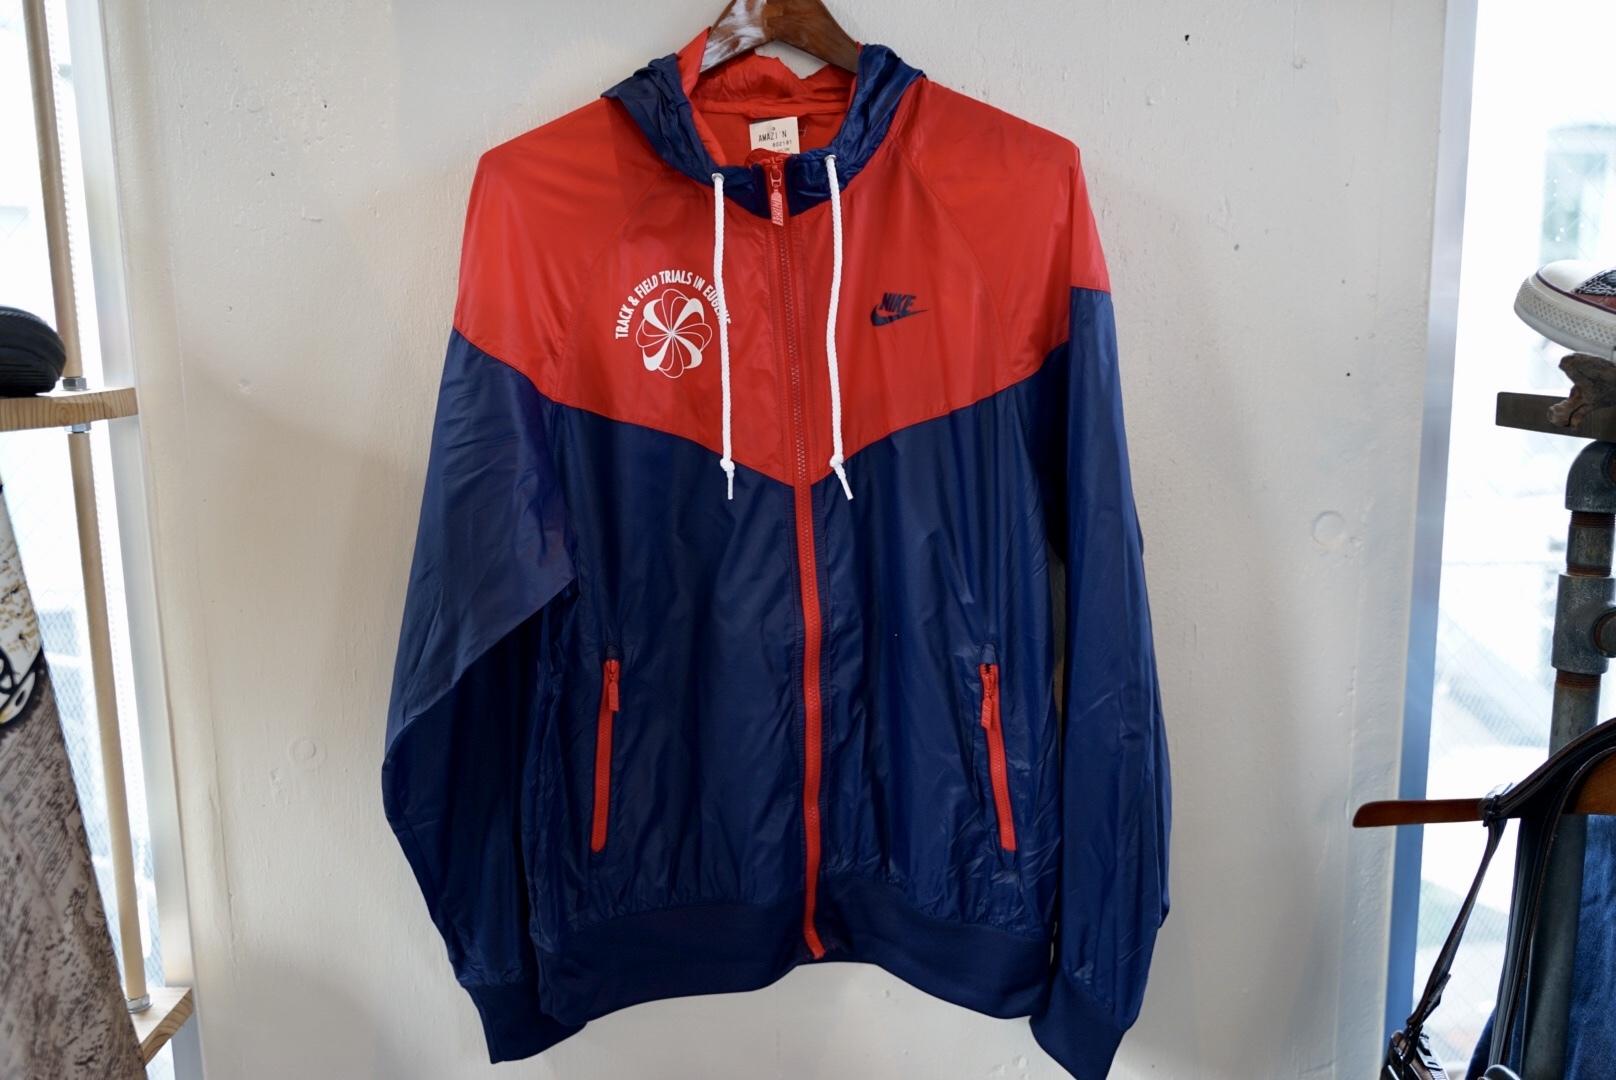 Nike 70s ナイロンジャケット 風車ロゴ